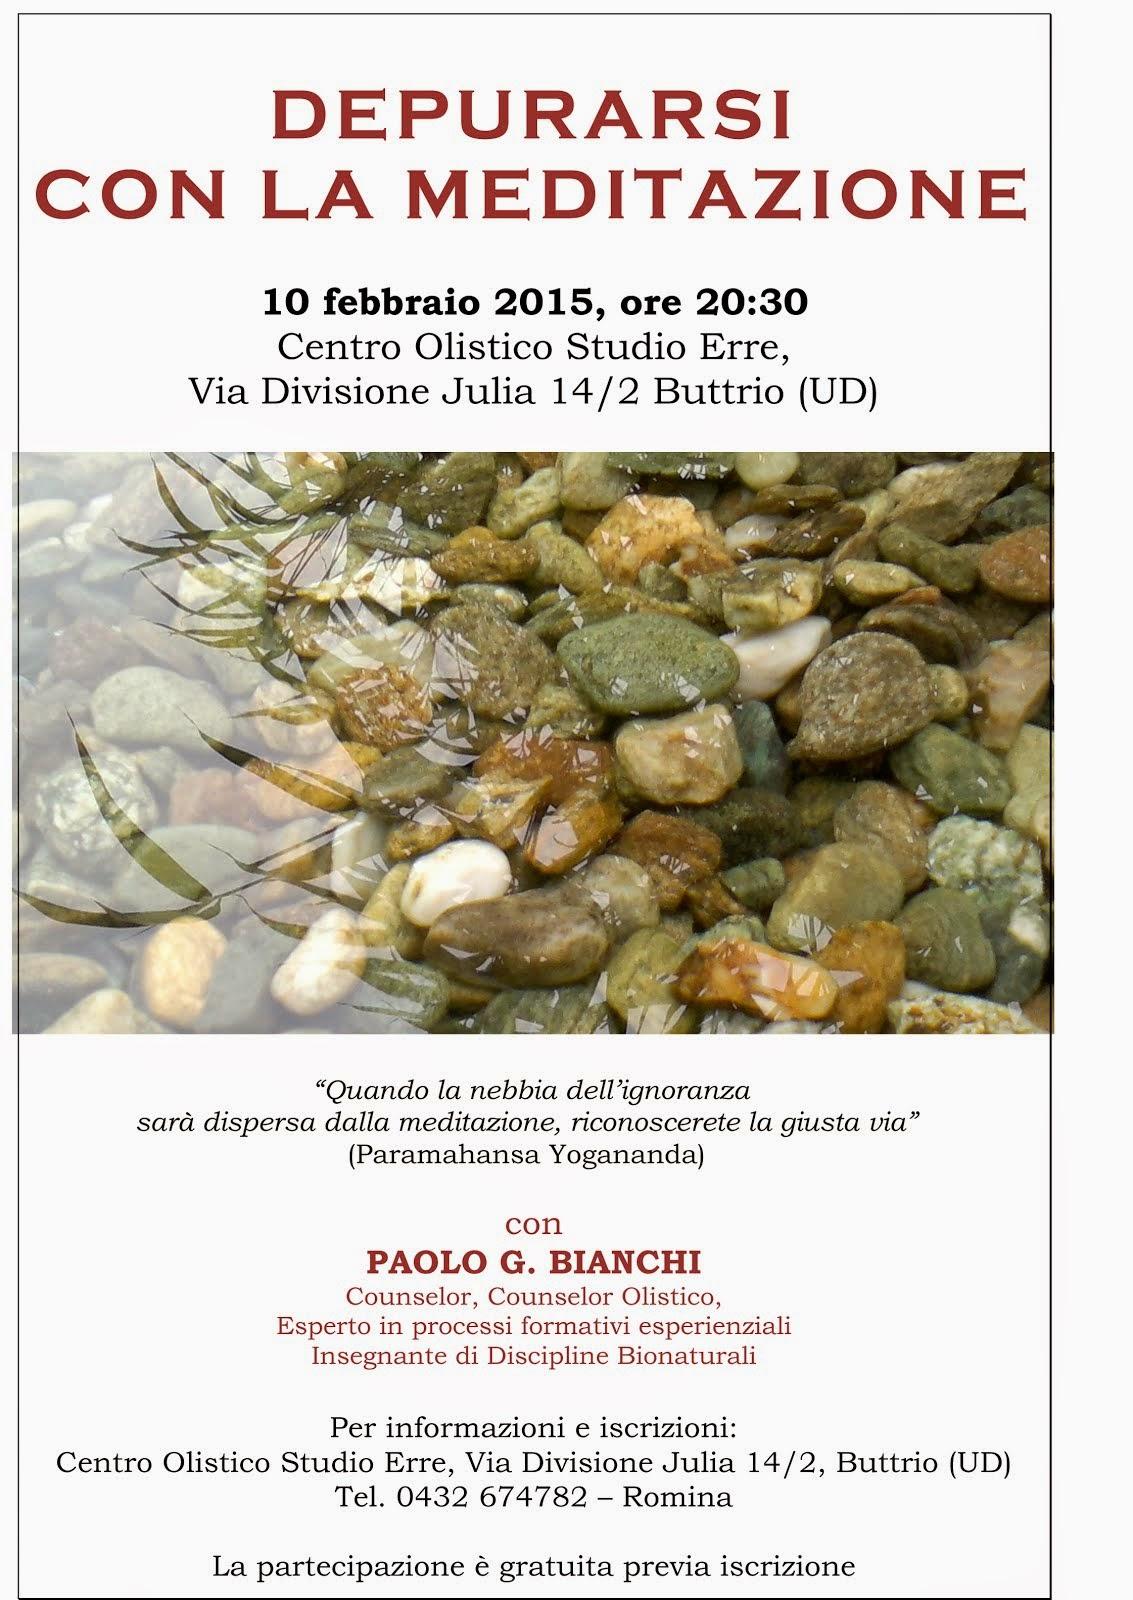 EVENTI: meditazione Febbraio a Buttrio (UD)